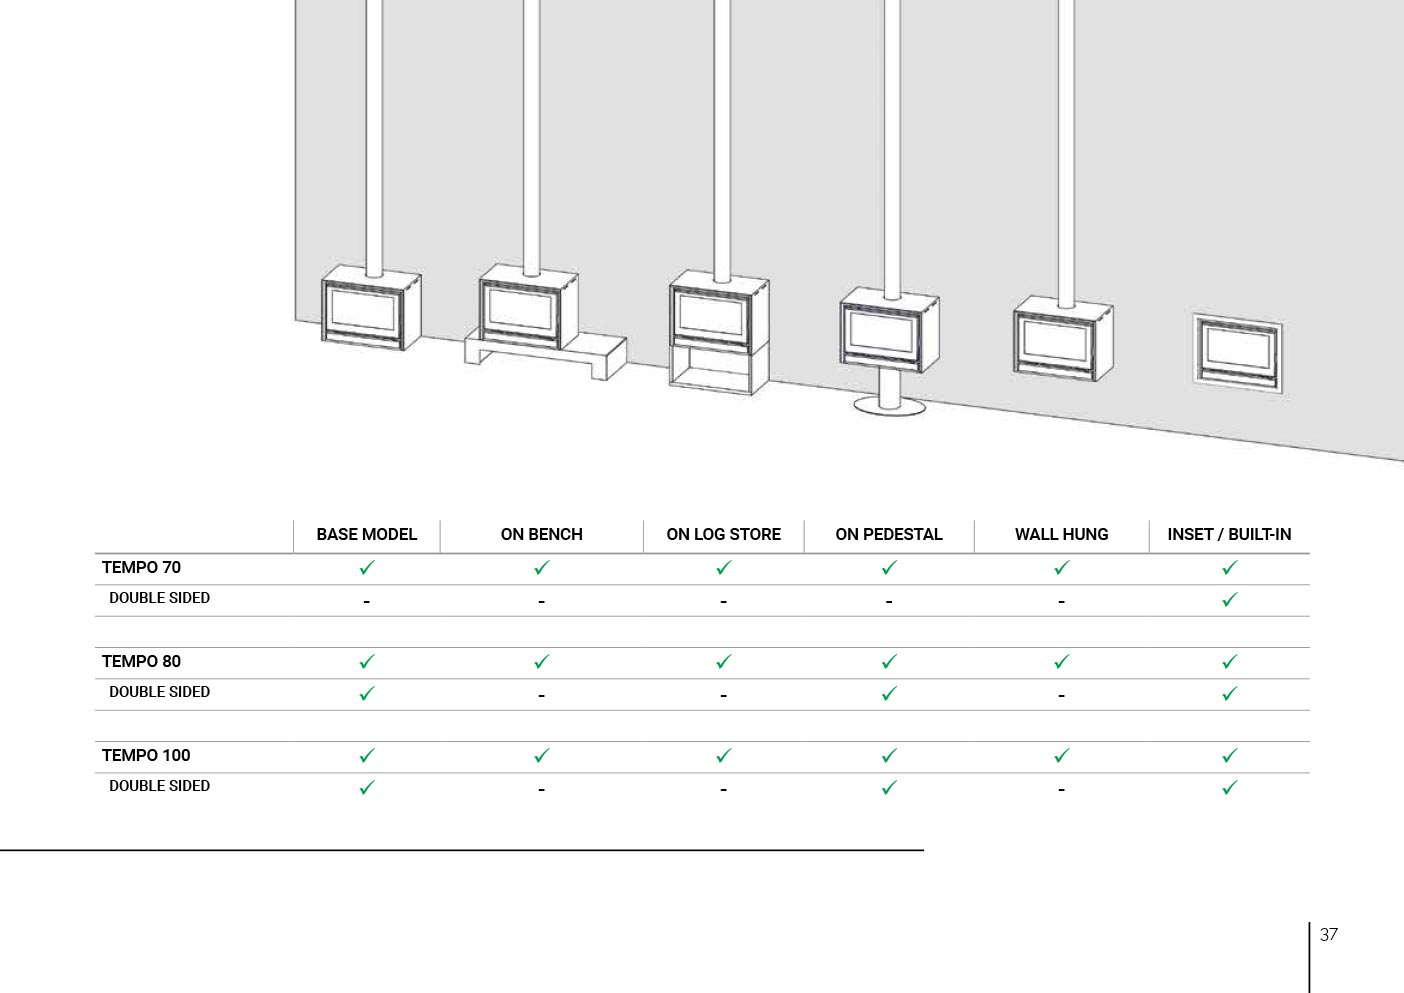 opus-stoves-brochure-(2)-37